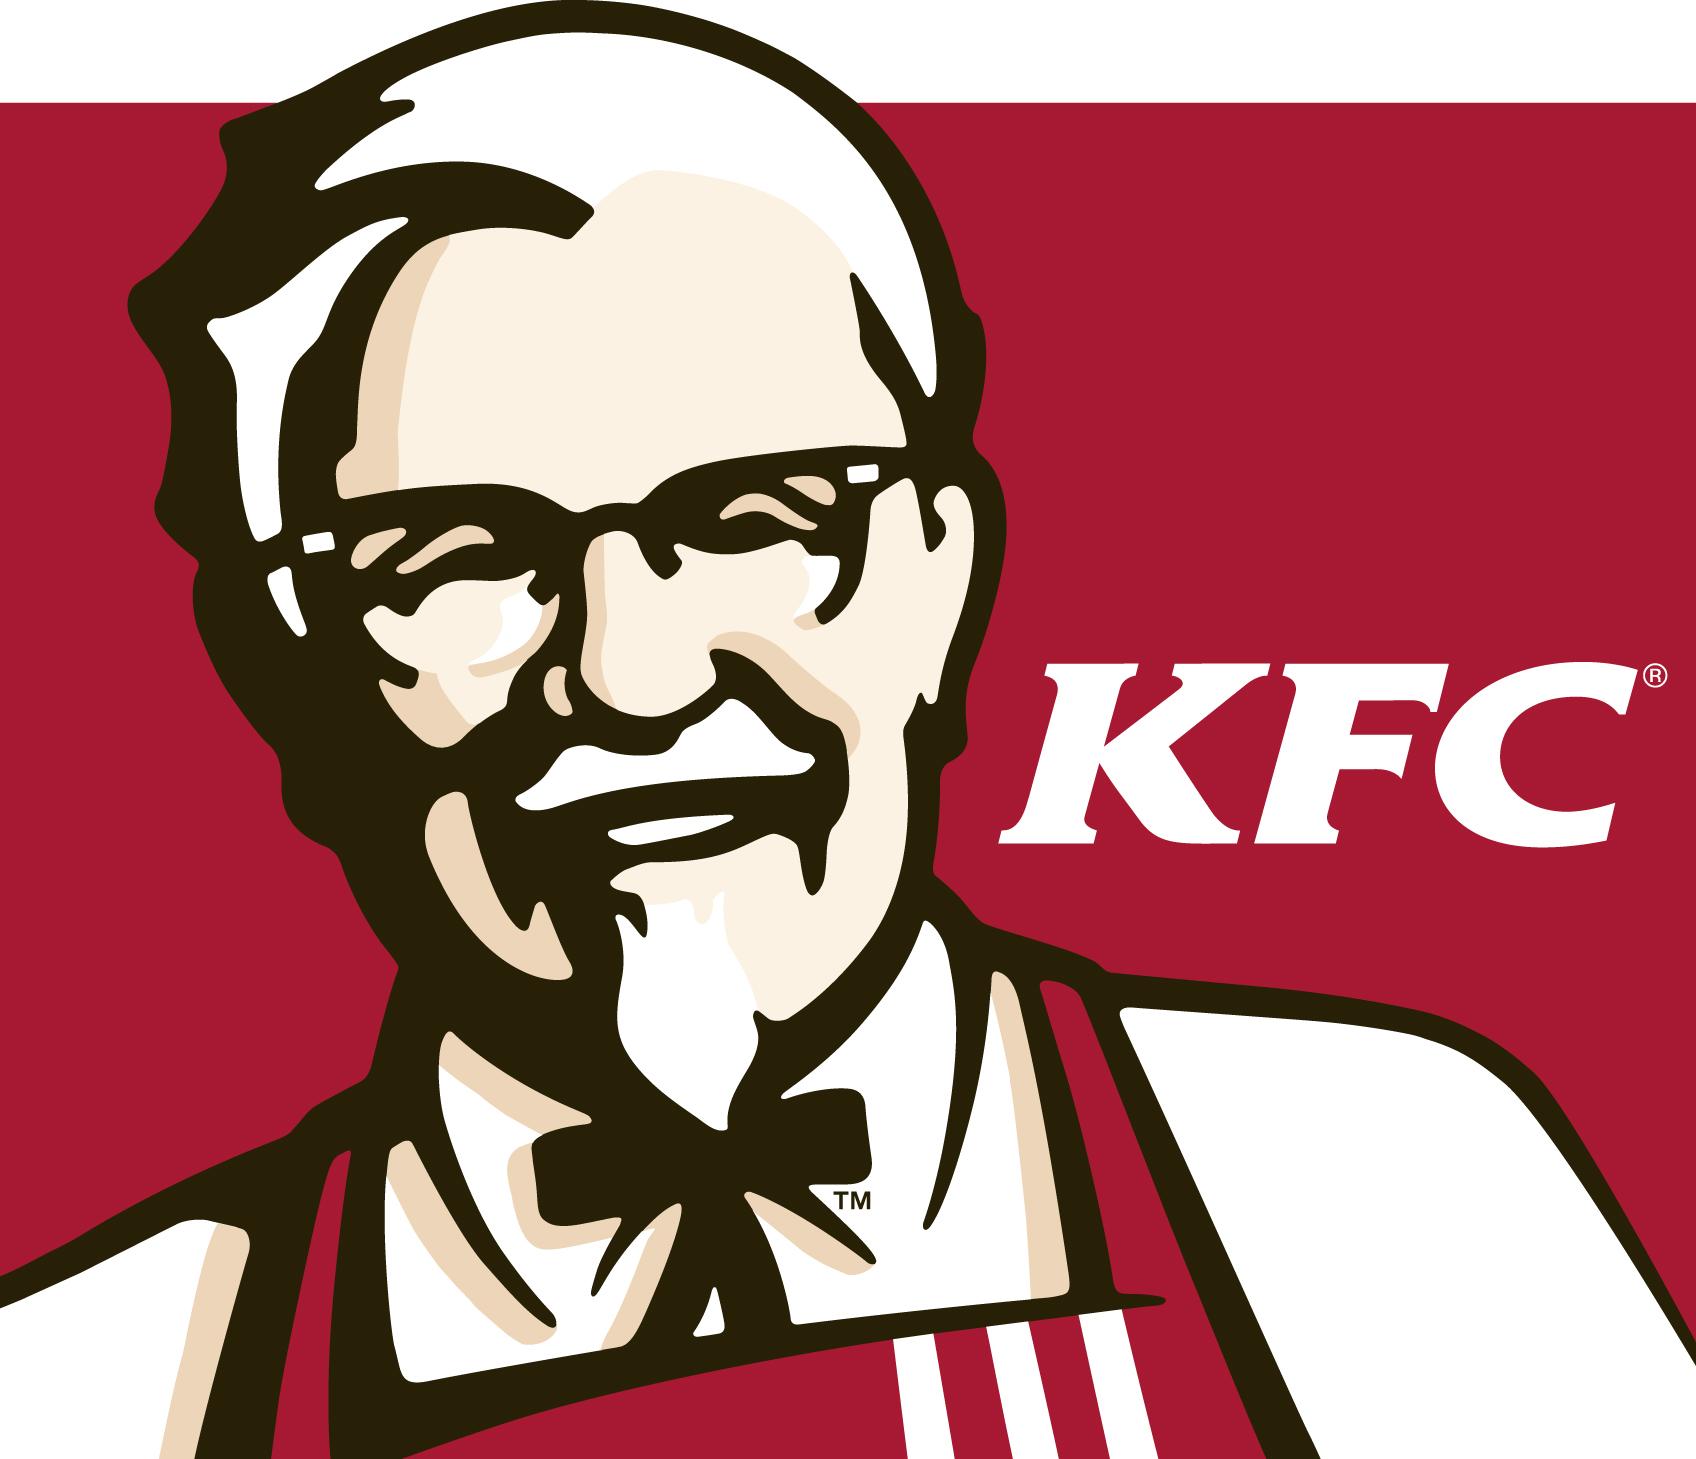 Výsledek obrázku pro logo kfc